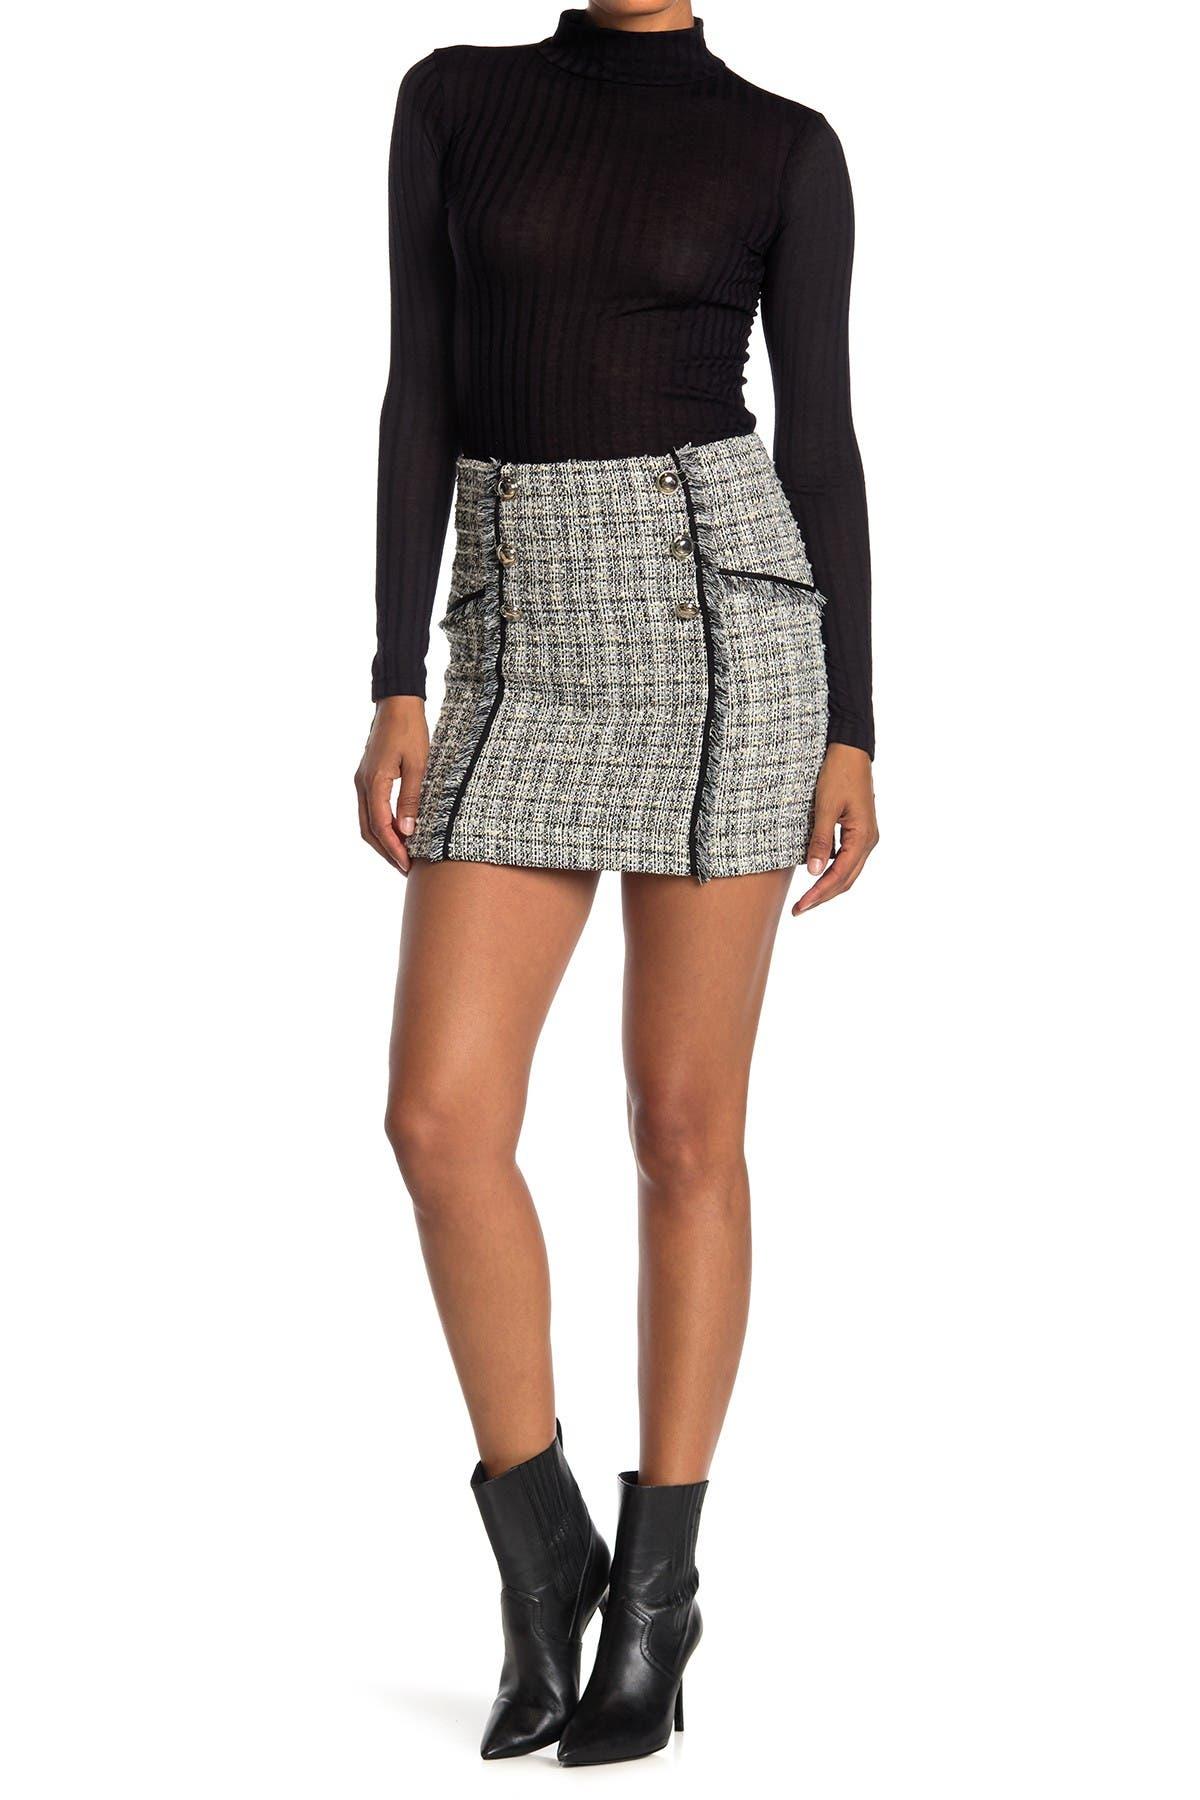 Image of VERONICA BEARD Starck Tweed Button Front Mini Skirt